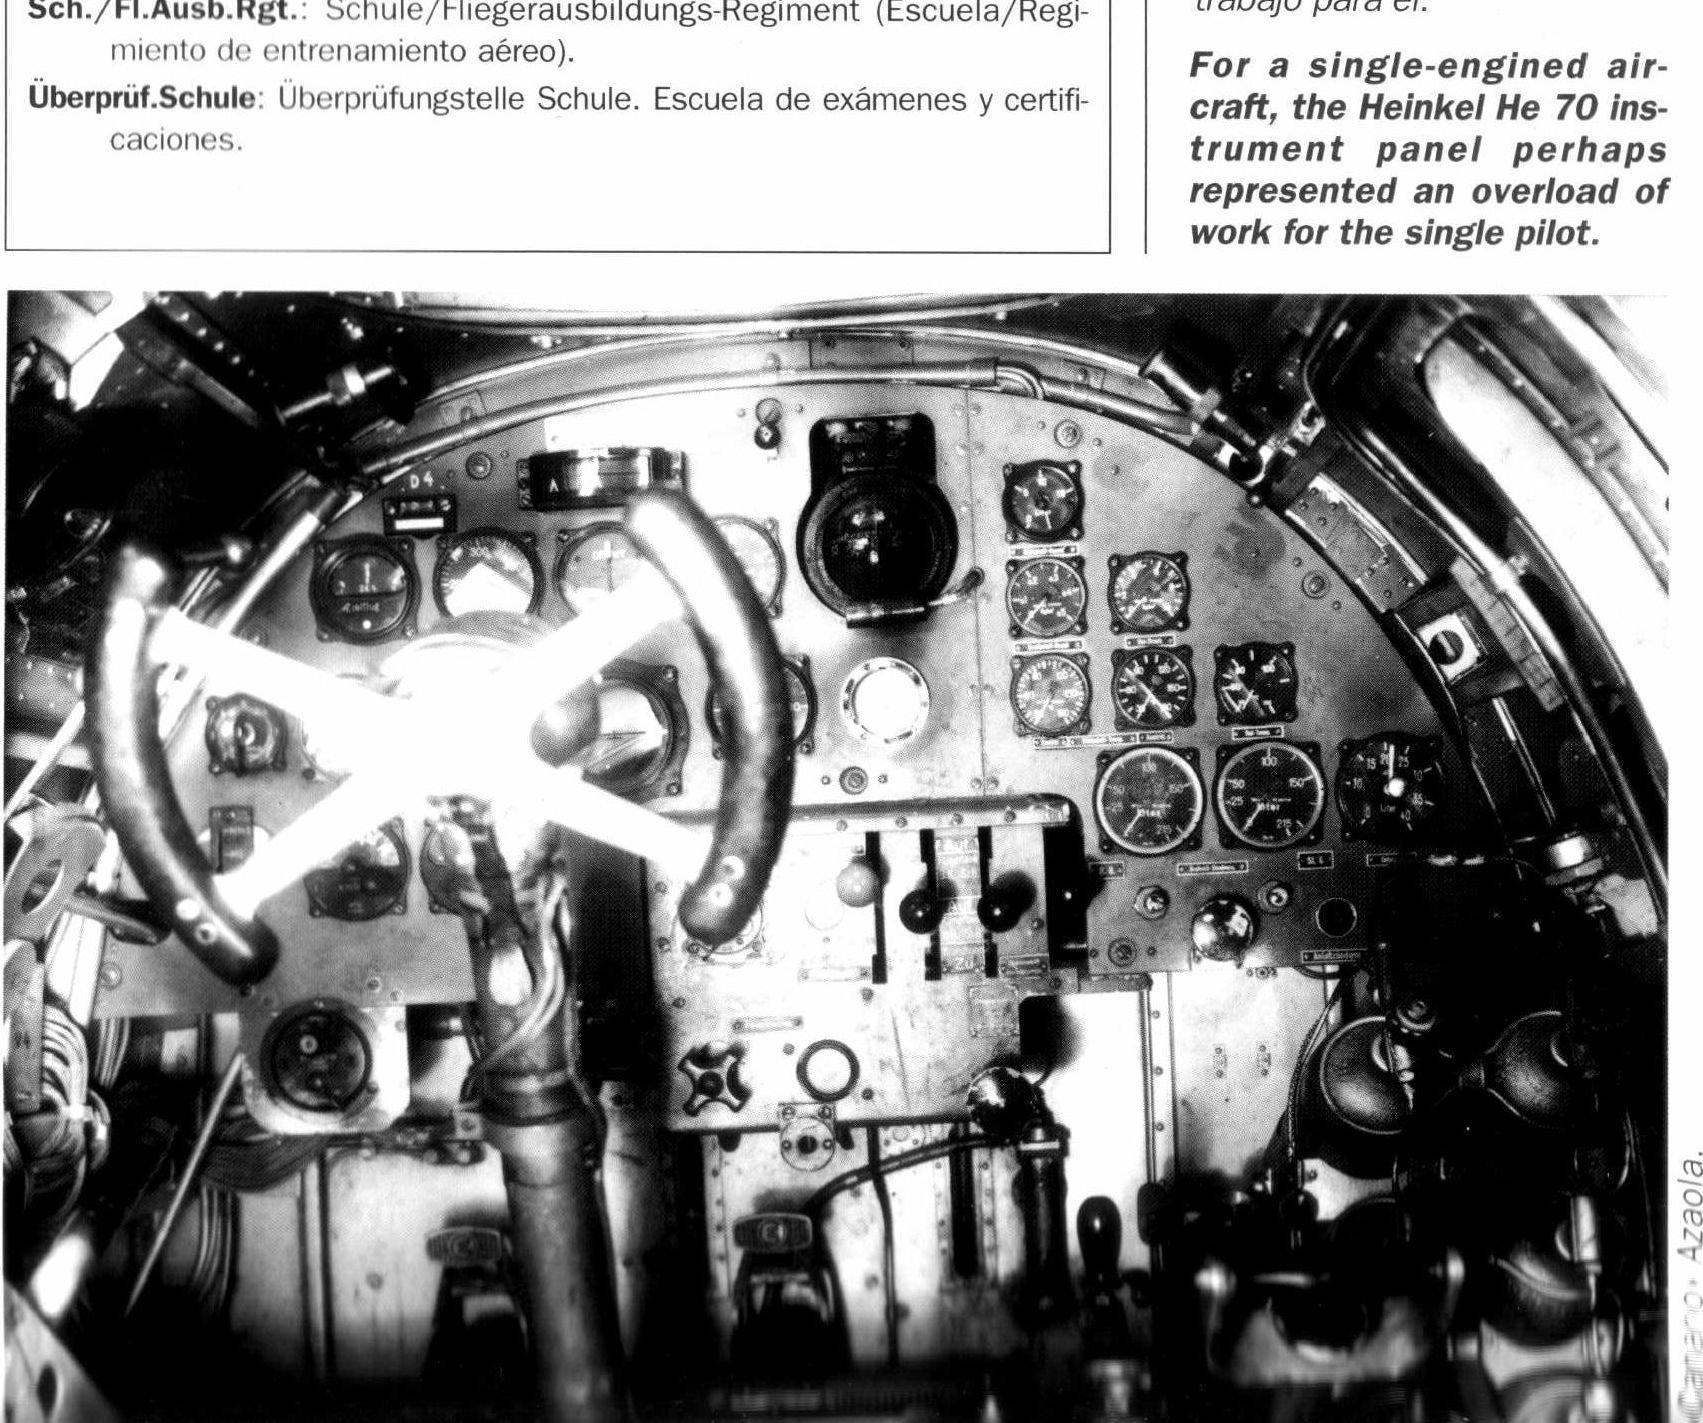 Heinkel He-70 Blitz-clipboard03.jpg